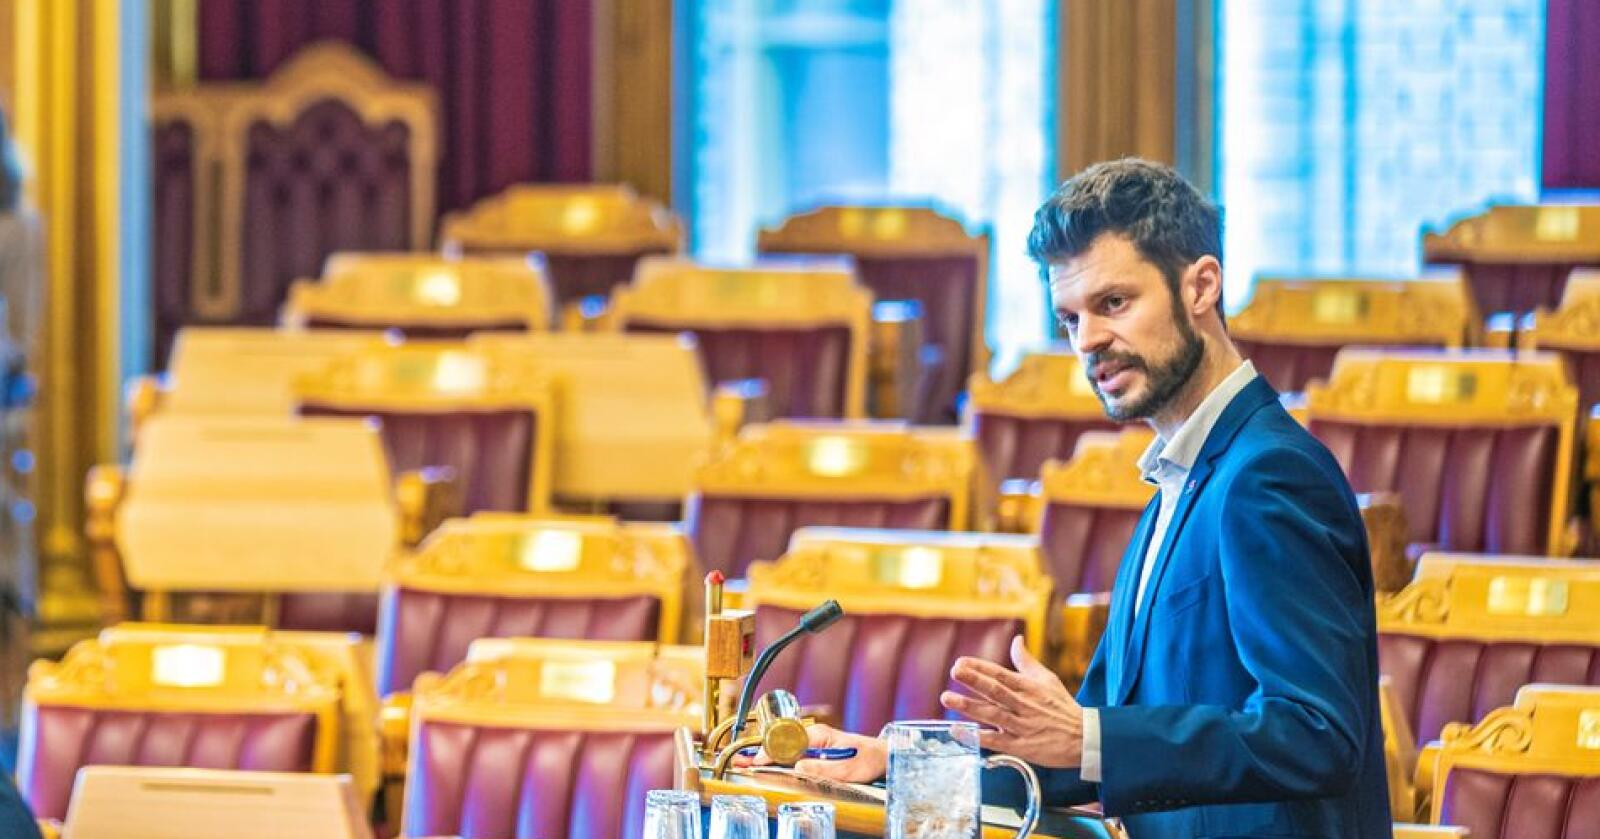 Bjørnar Moxnes (Rødt) ber forsvarsminister Frank Bakke-Jensen ta regningen til tre HV-soldater. Foto: Stian Lysberg Solum / NTB